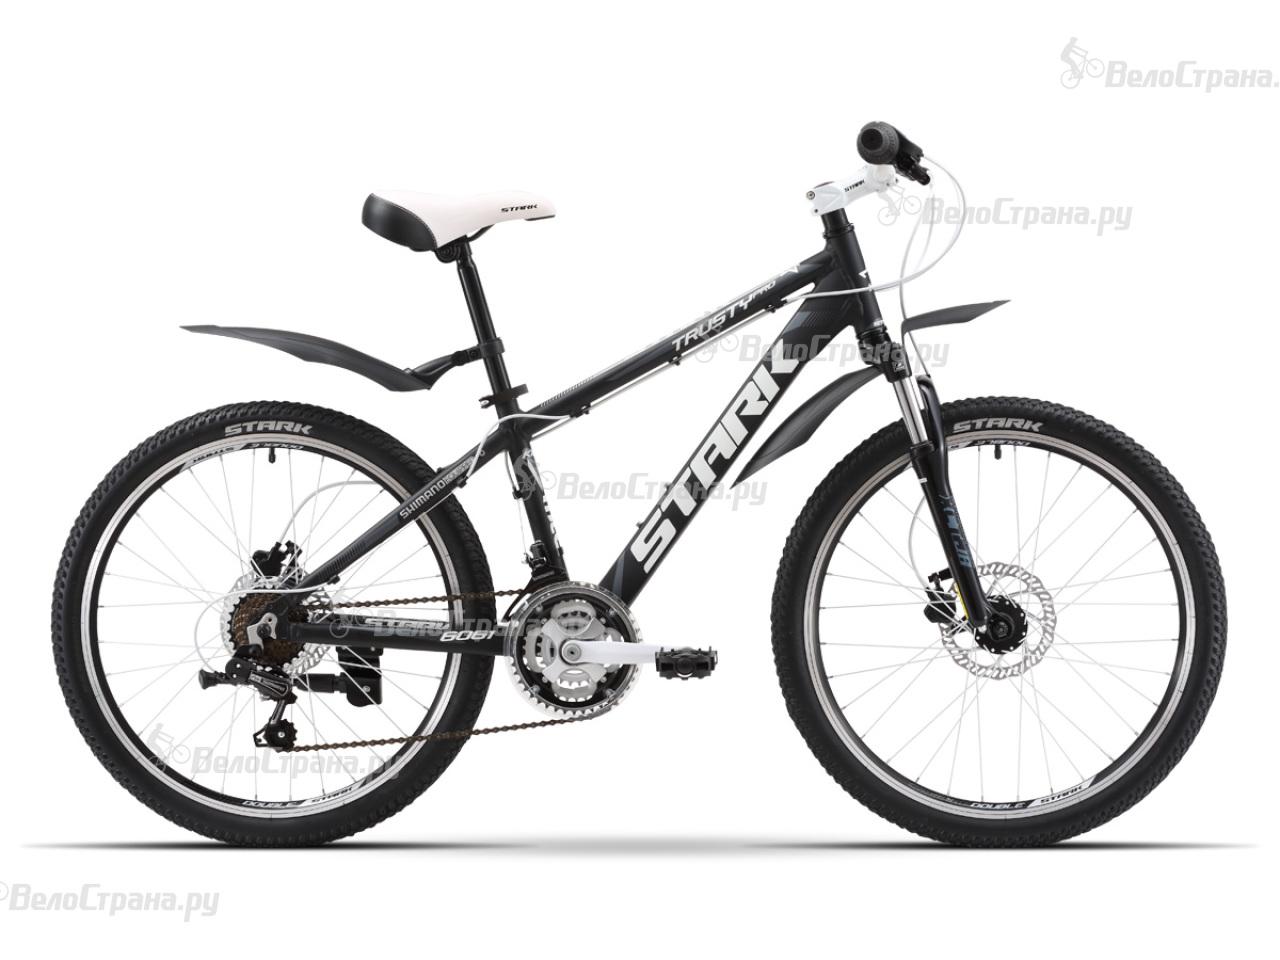 Велосипед Stark Trusty Pro (2015) рюкзак mcm 61i 33p 015 2015 stark l1